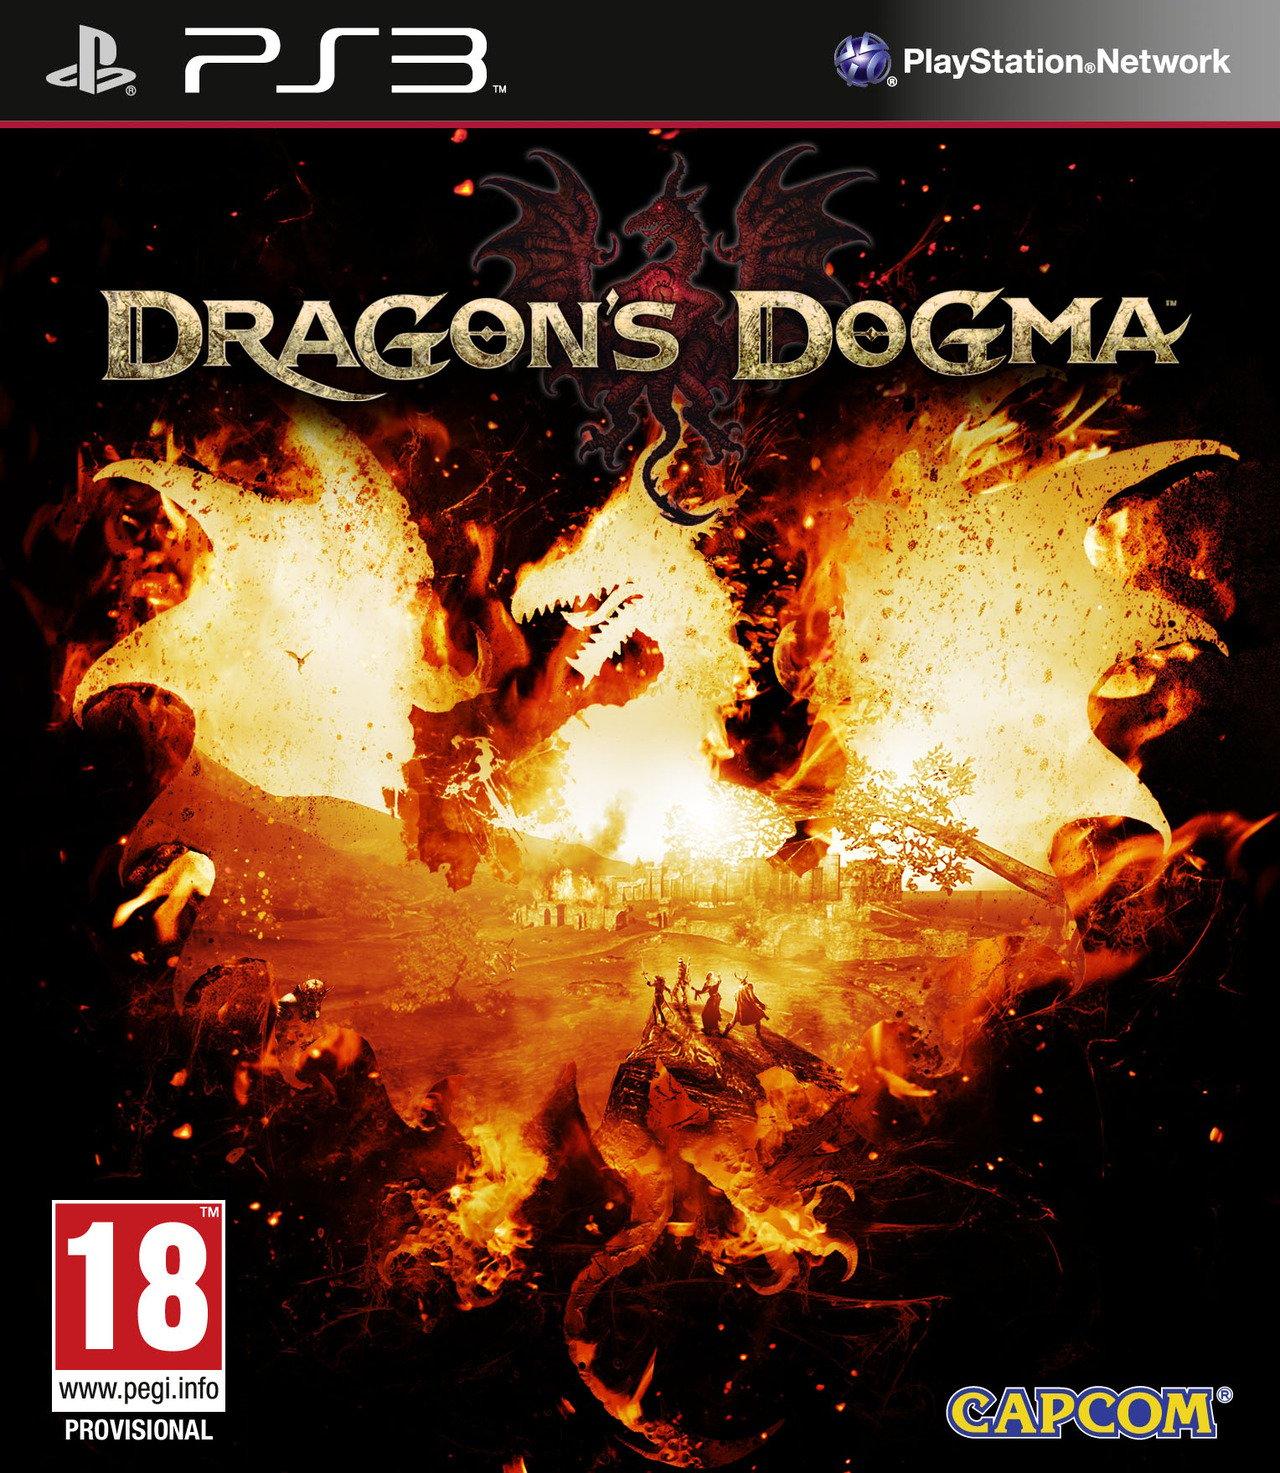 Dragon-sDogma PS3 Jaquette 003